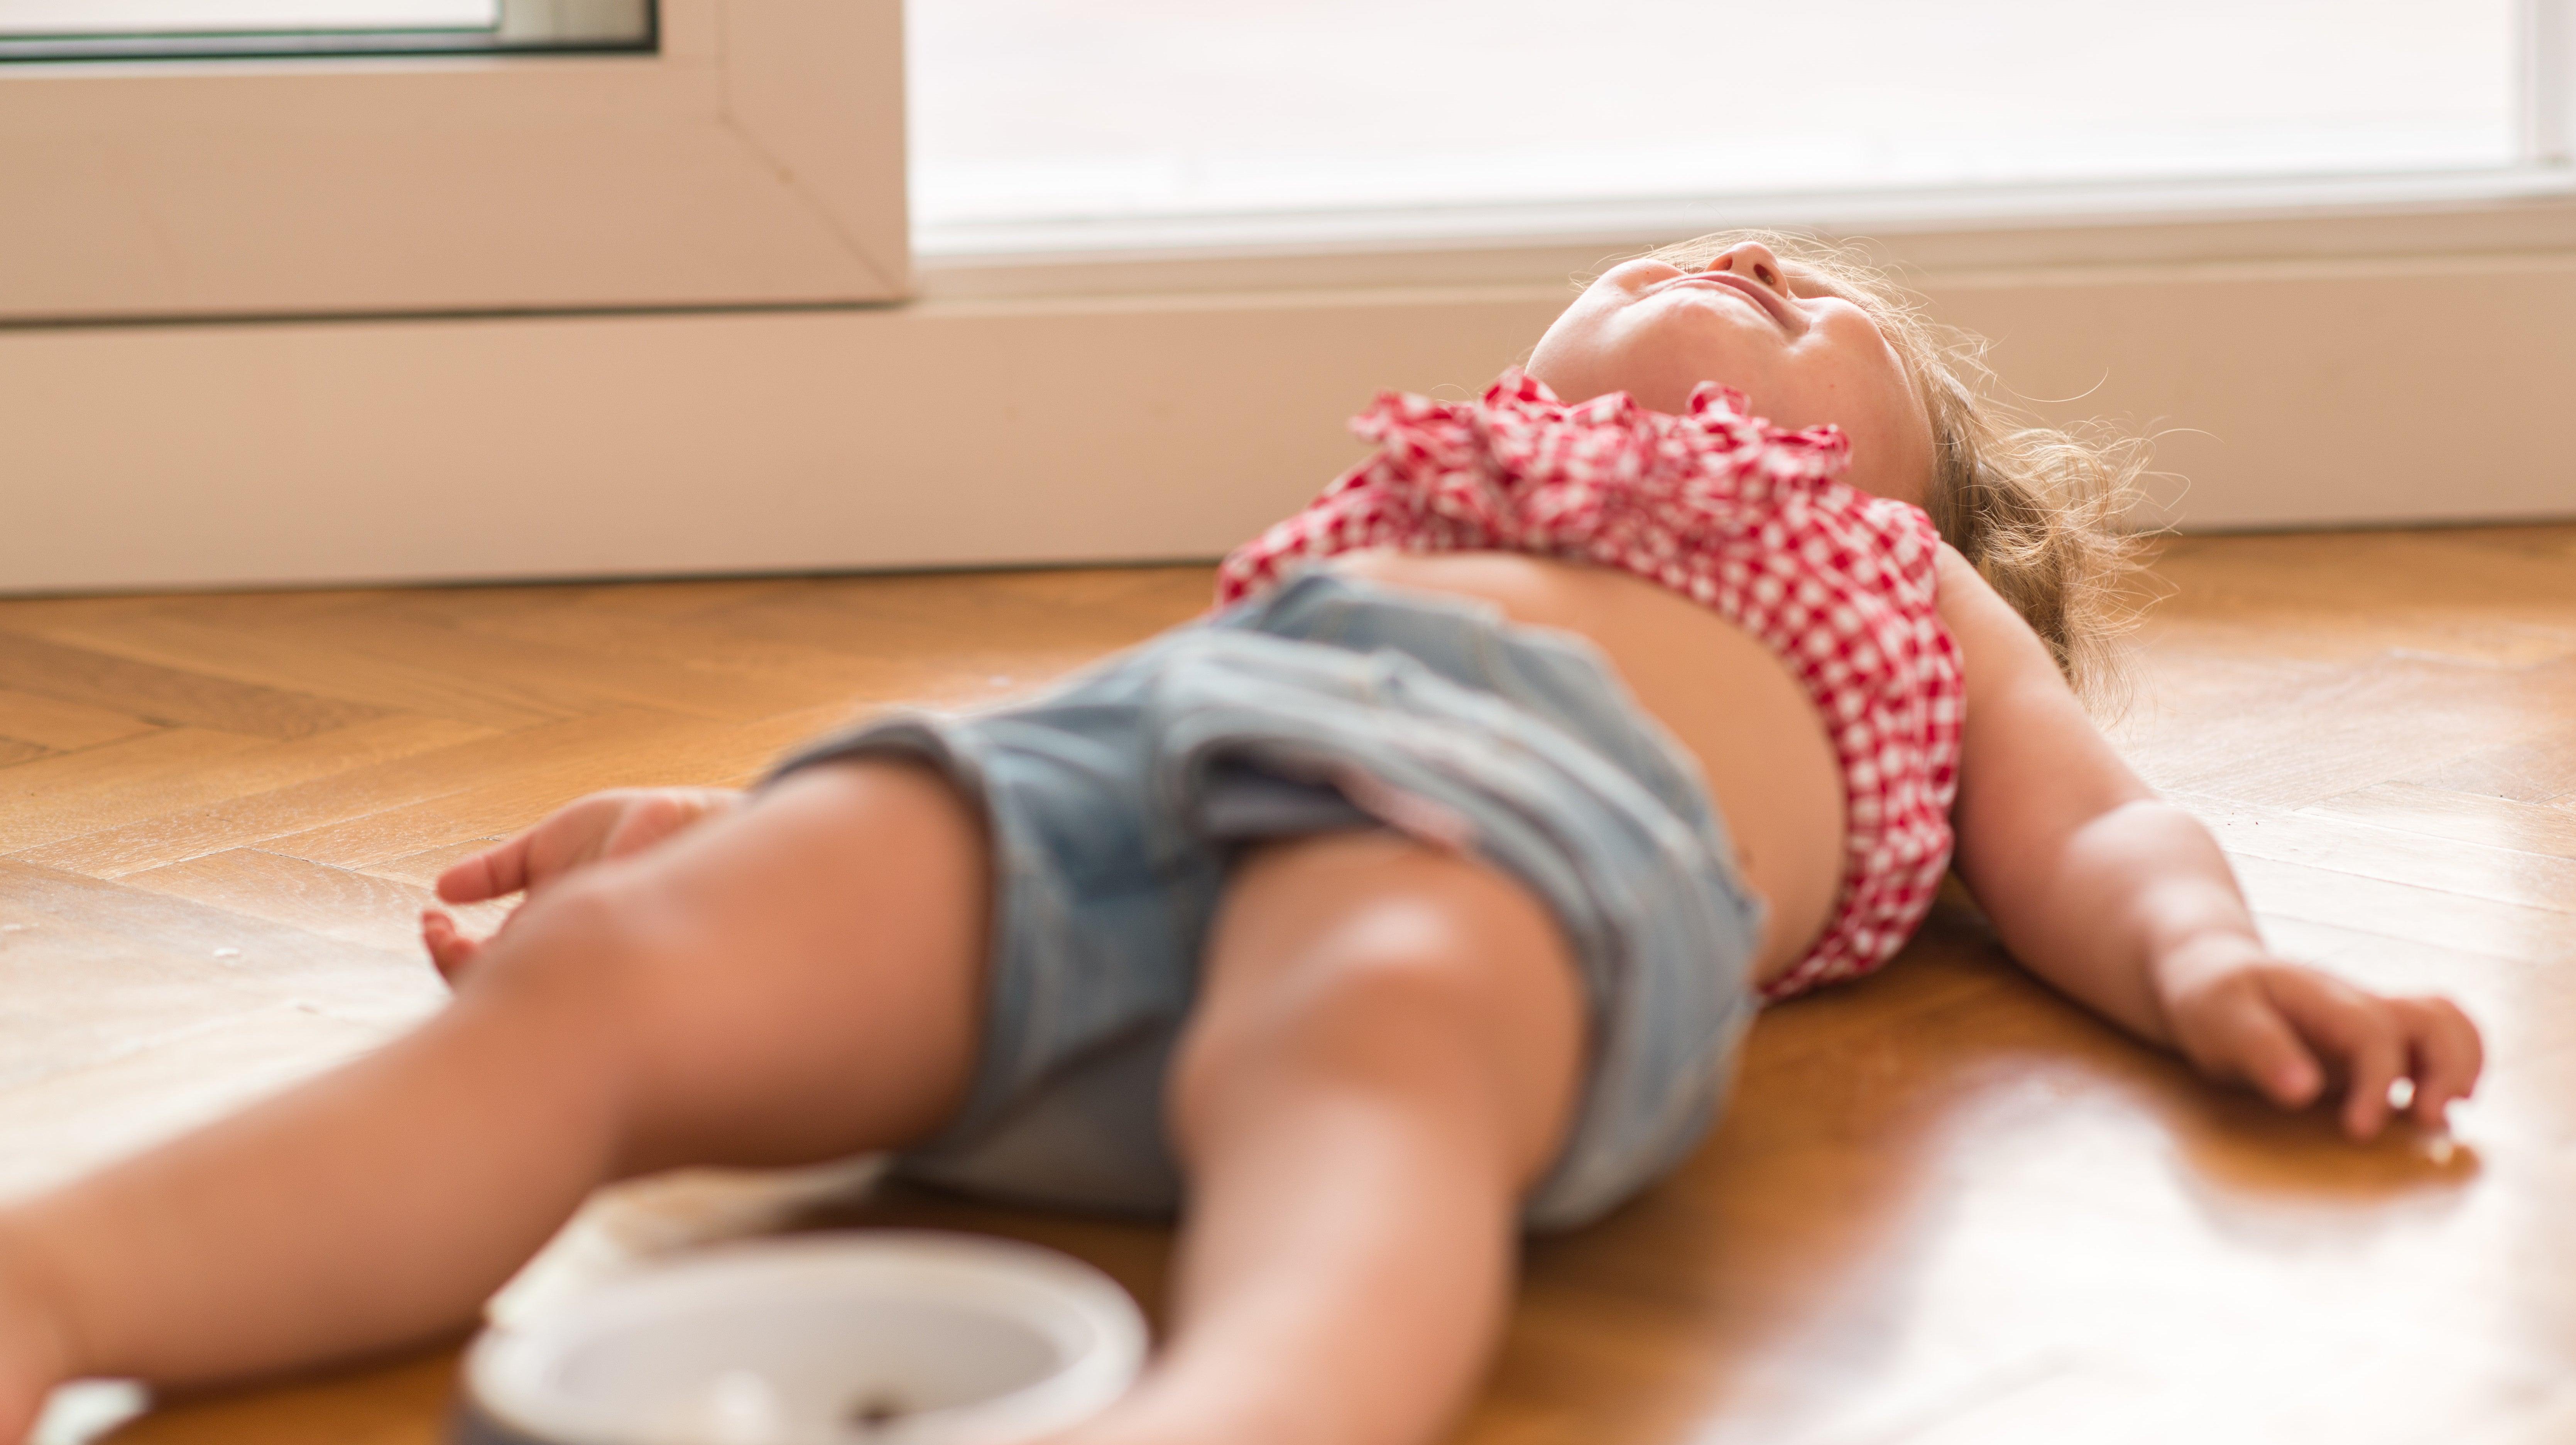 Help Kids Calm Down With A 'Brain Game'